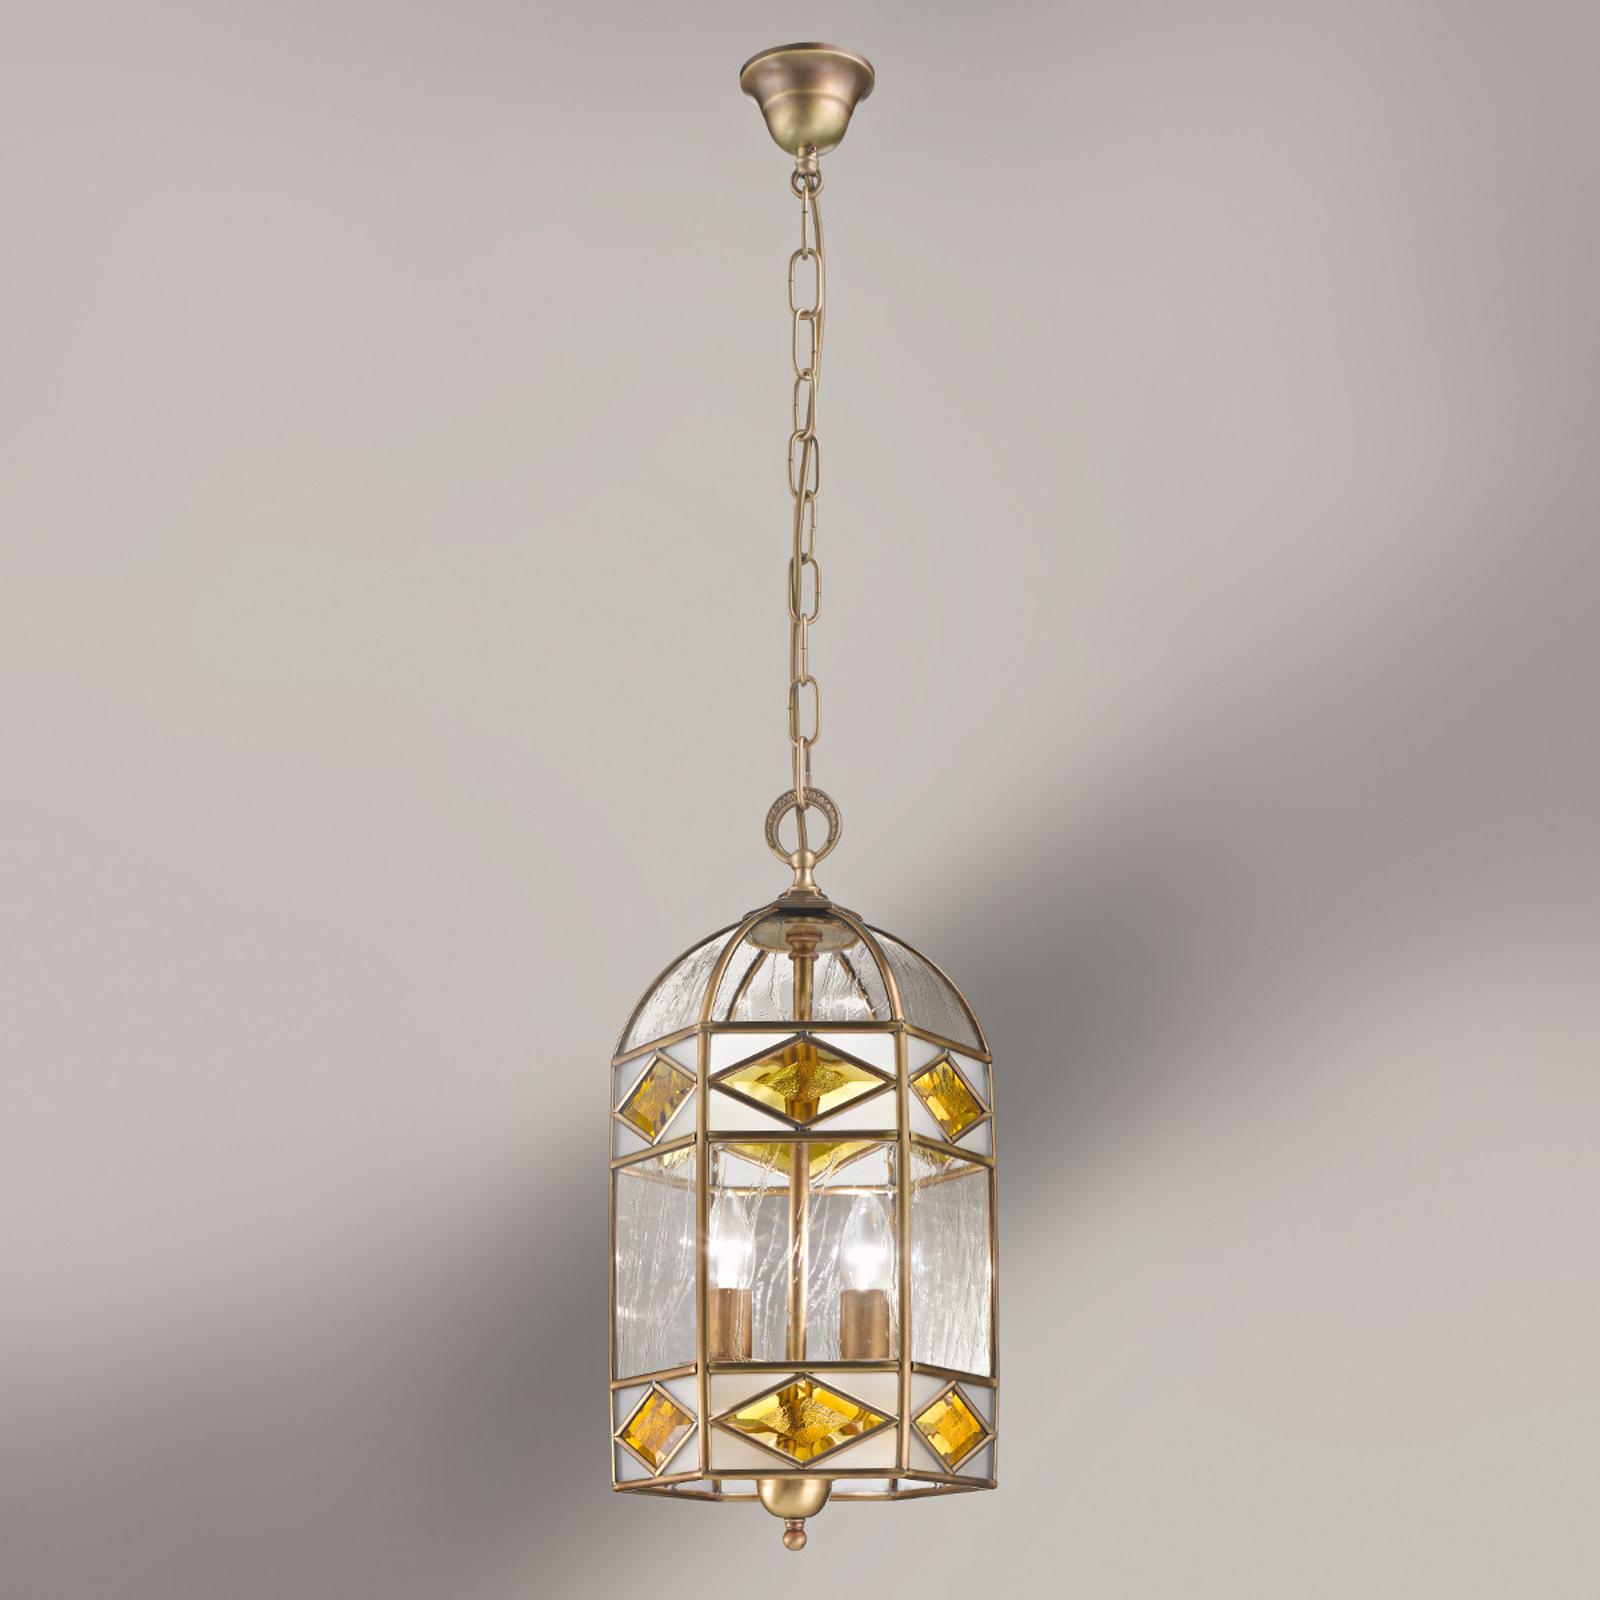 Emilia - hanglamp met kathedraalglas